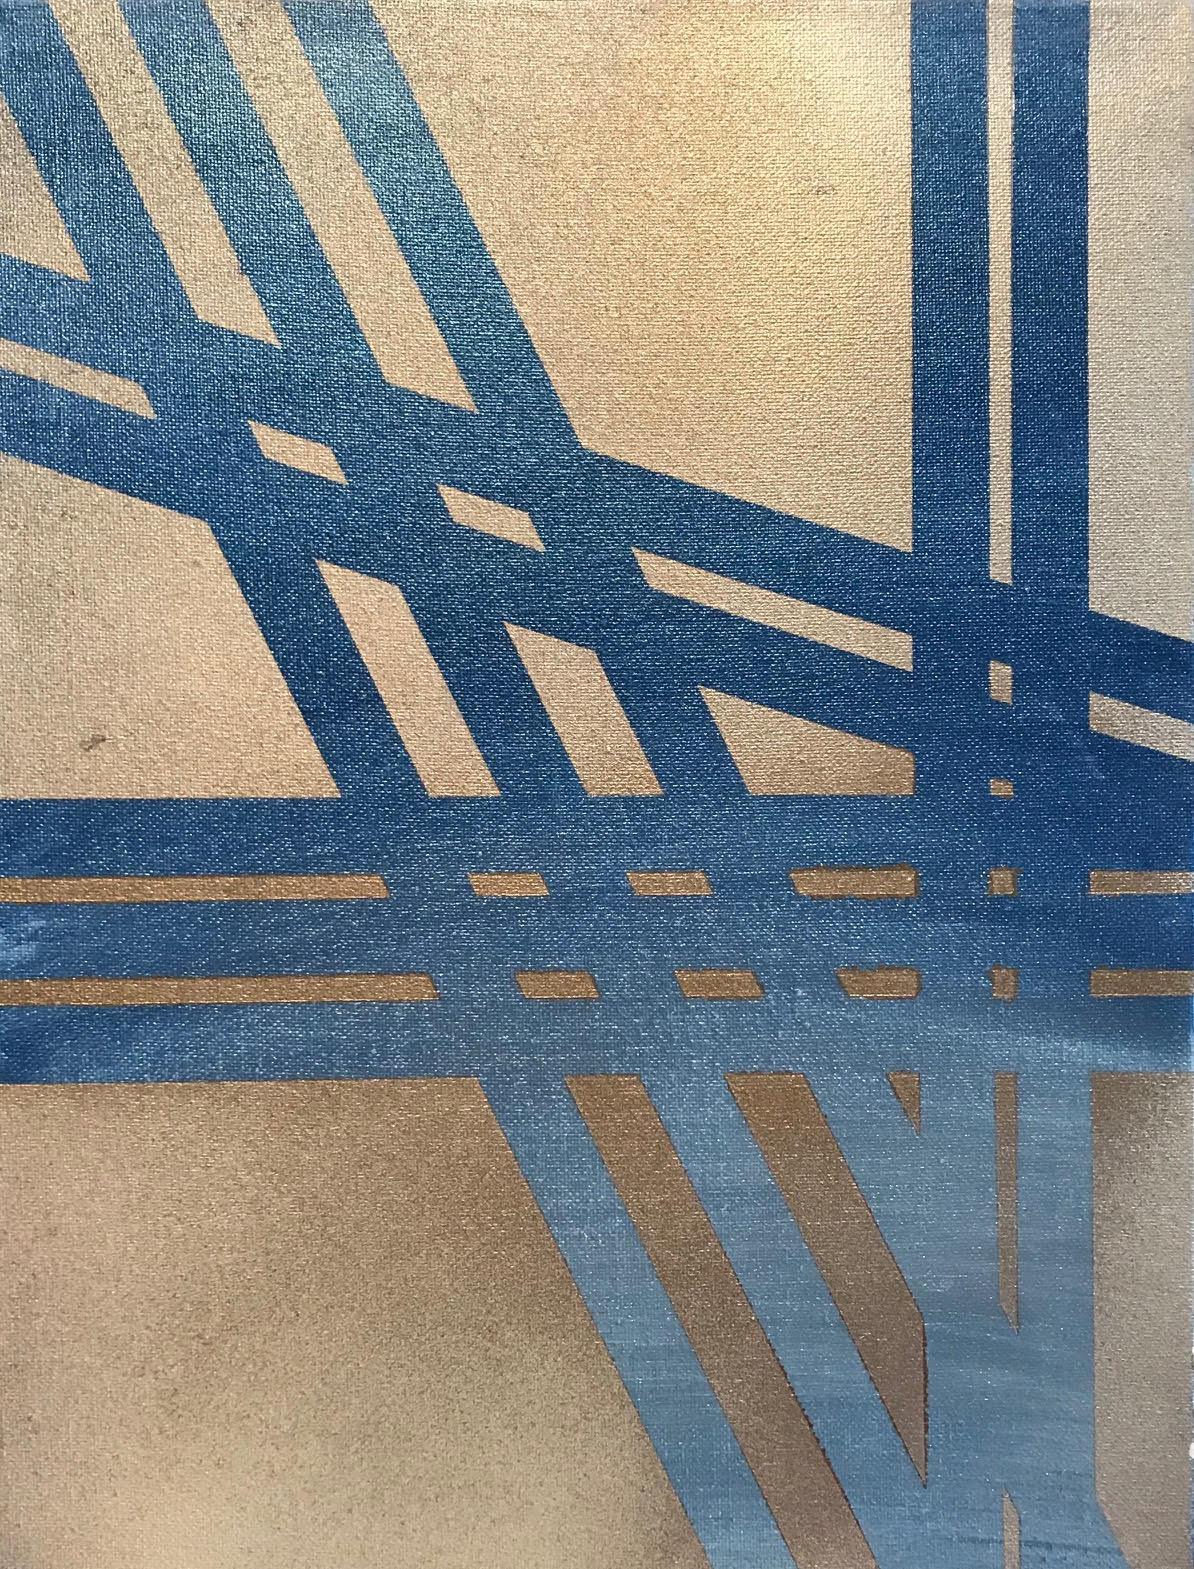 Cranes for Days No 4 - Spray Paint/Acrylic